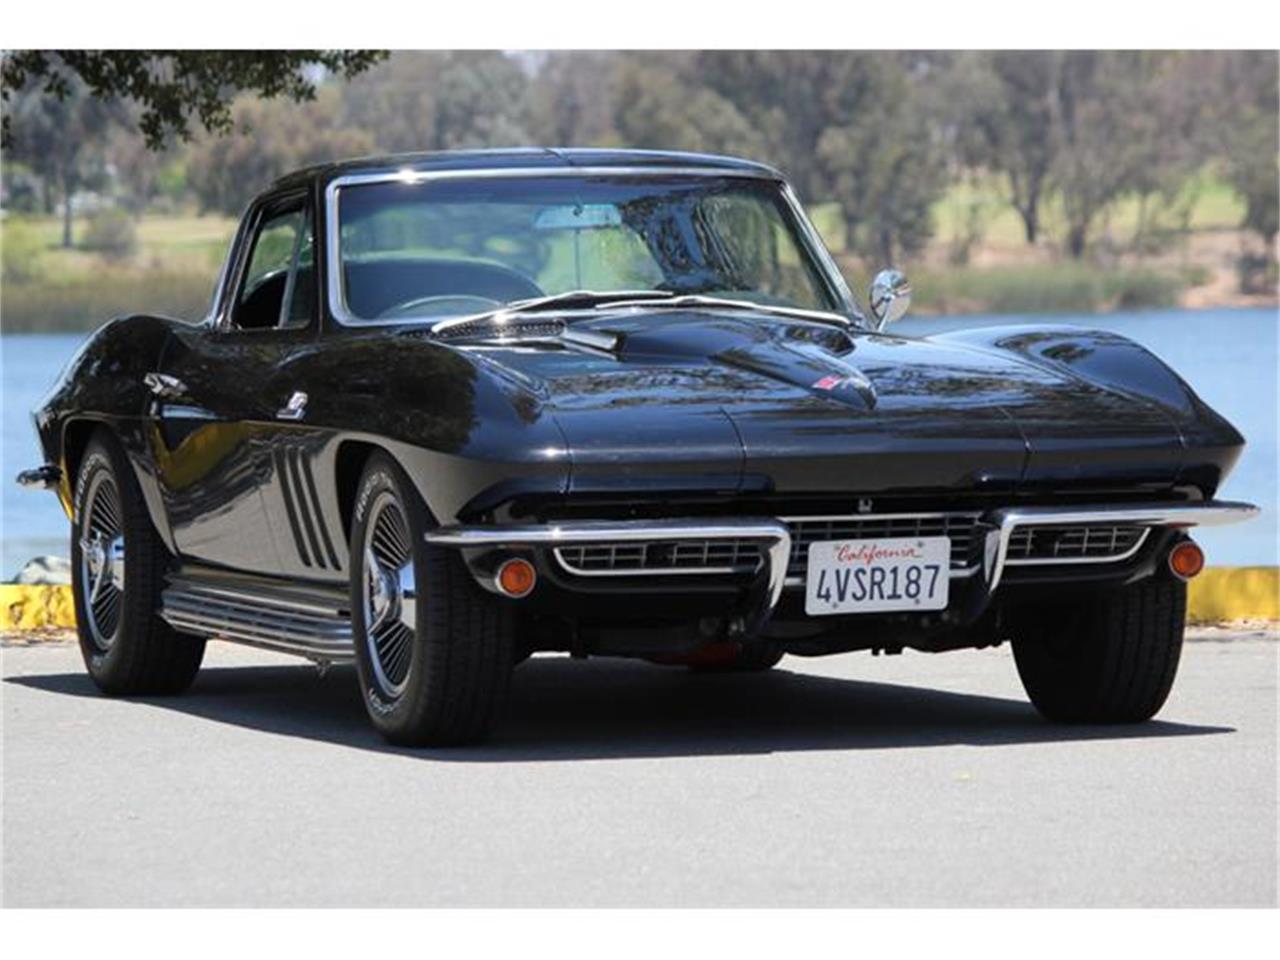 Large Picture of '66 Chevrolet Corvette located in California - EU77